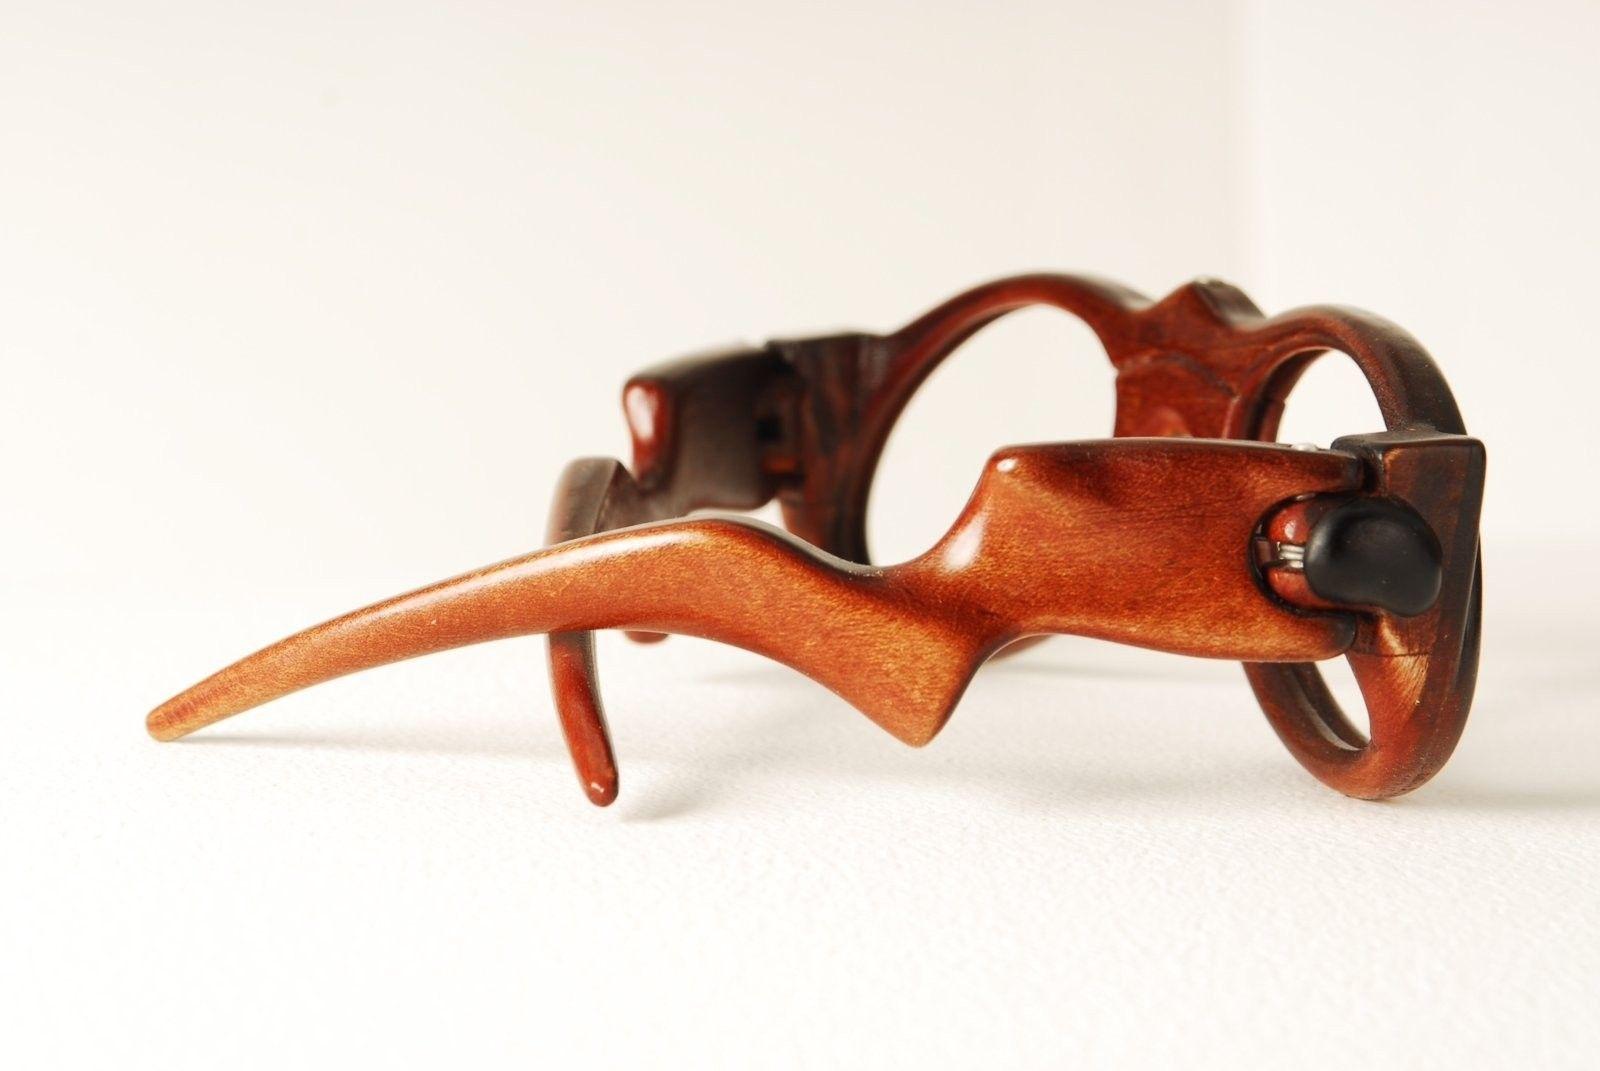 Spectacular Handmade Wooden Sunglasses - 2016-05 Jaromir Oval 22.JPG